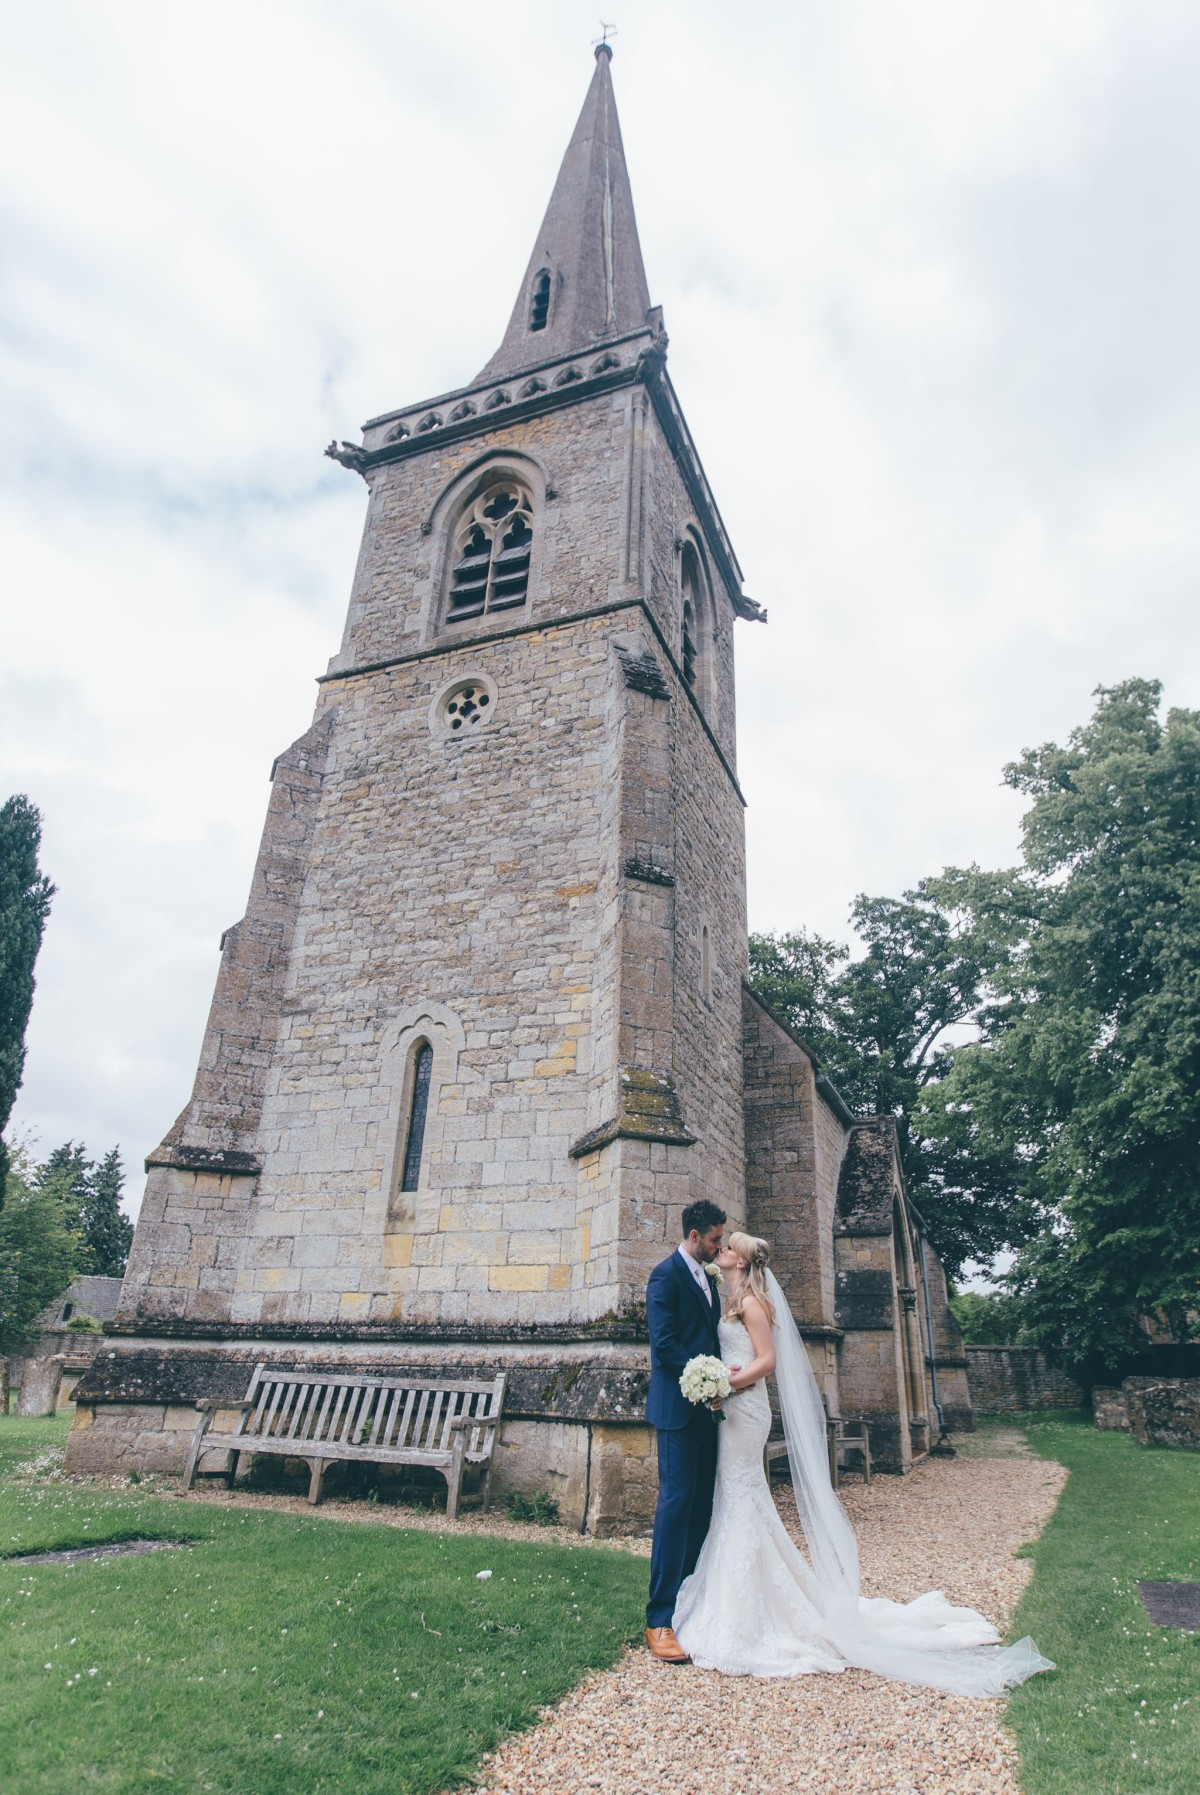 welsh_wedding_photographer_rachel_lambert_photography_lower_slaughter_manor_house_cotswolds_harriet_dean_ 27